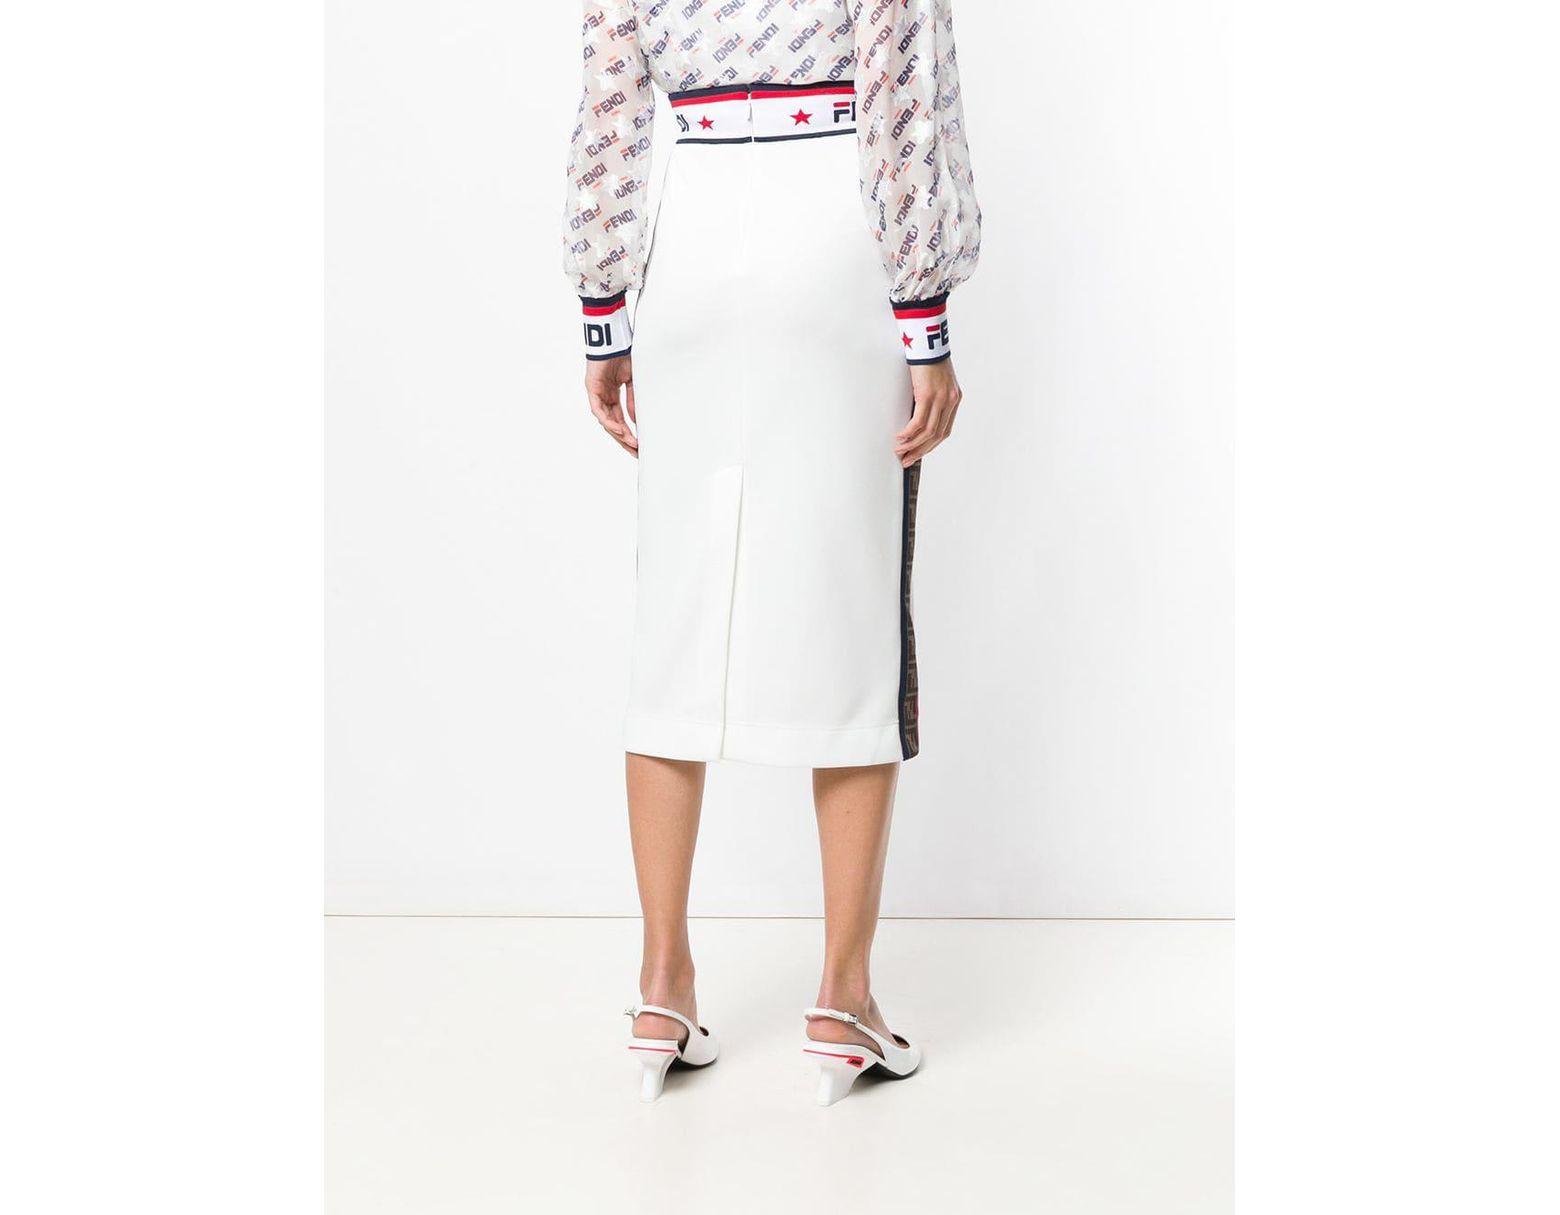 df5cfe77a Fendi X Fila Pencil Skirt in White - Save 40% - Lyst